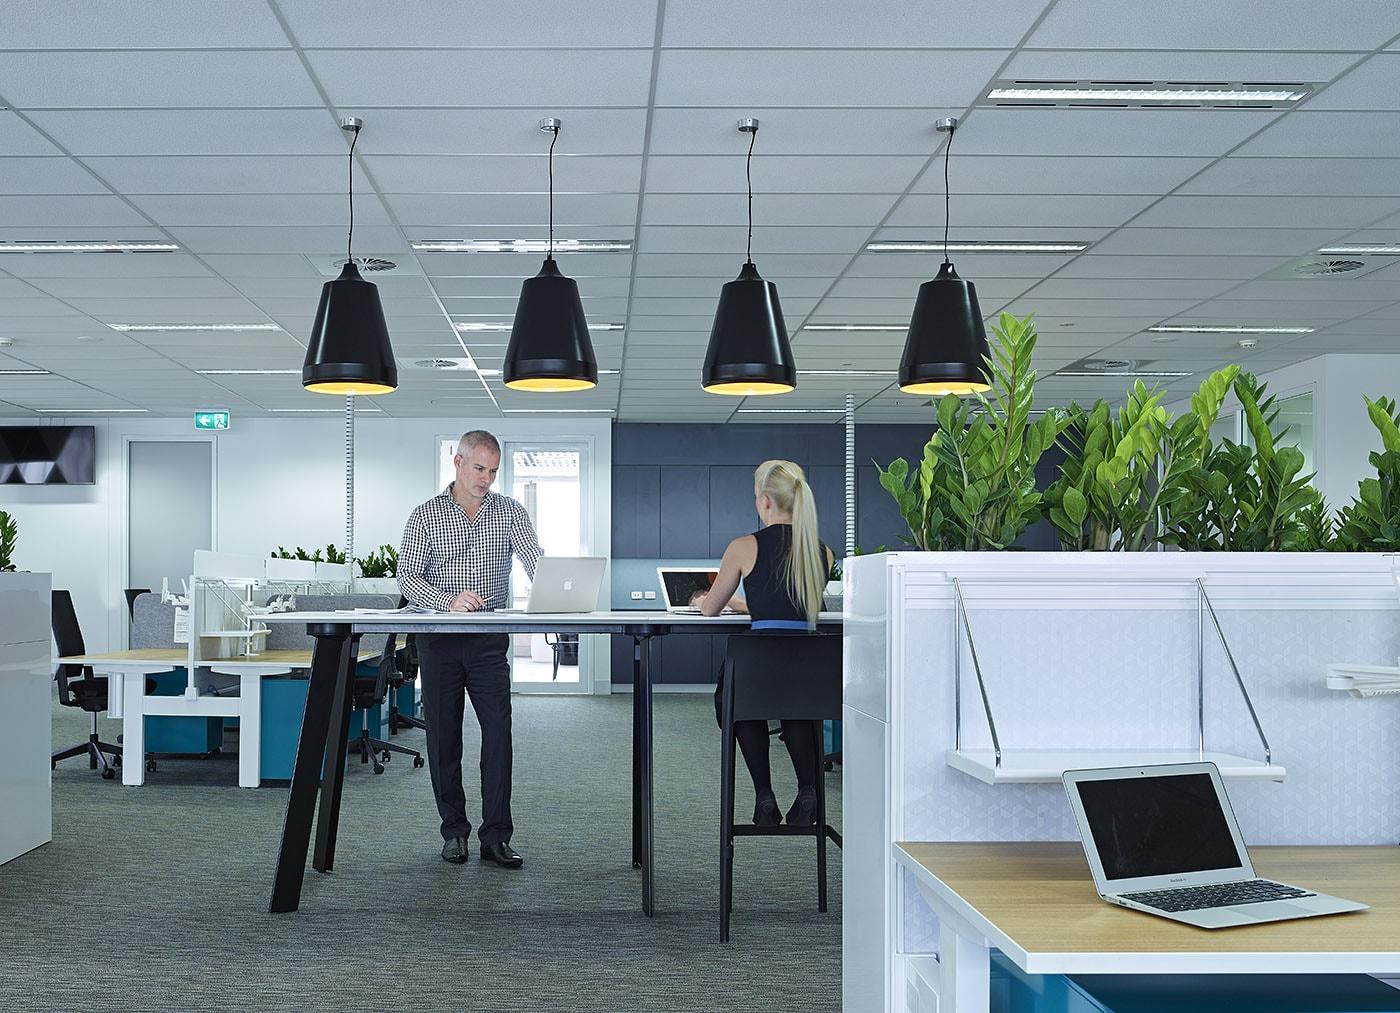 Ausure Brisbane Tenant Representation, Interior Design, Project & Construction Management Project Image 2 by PCG